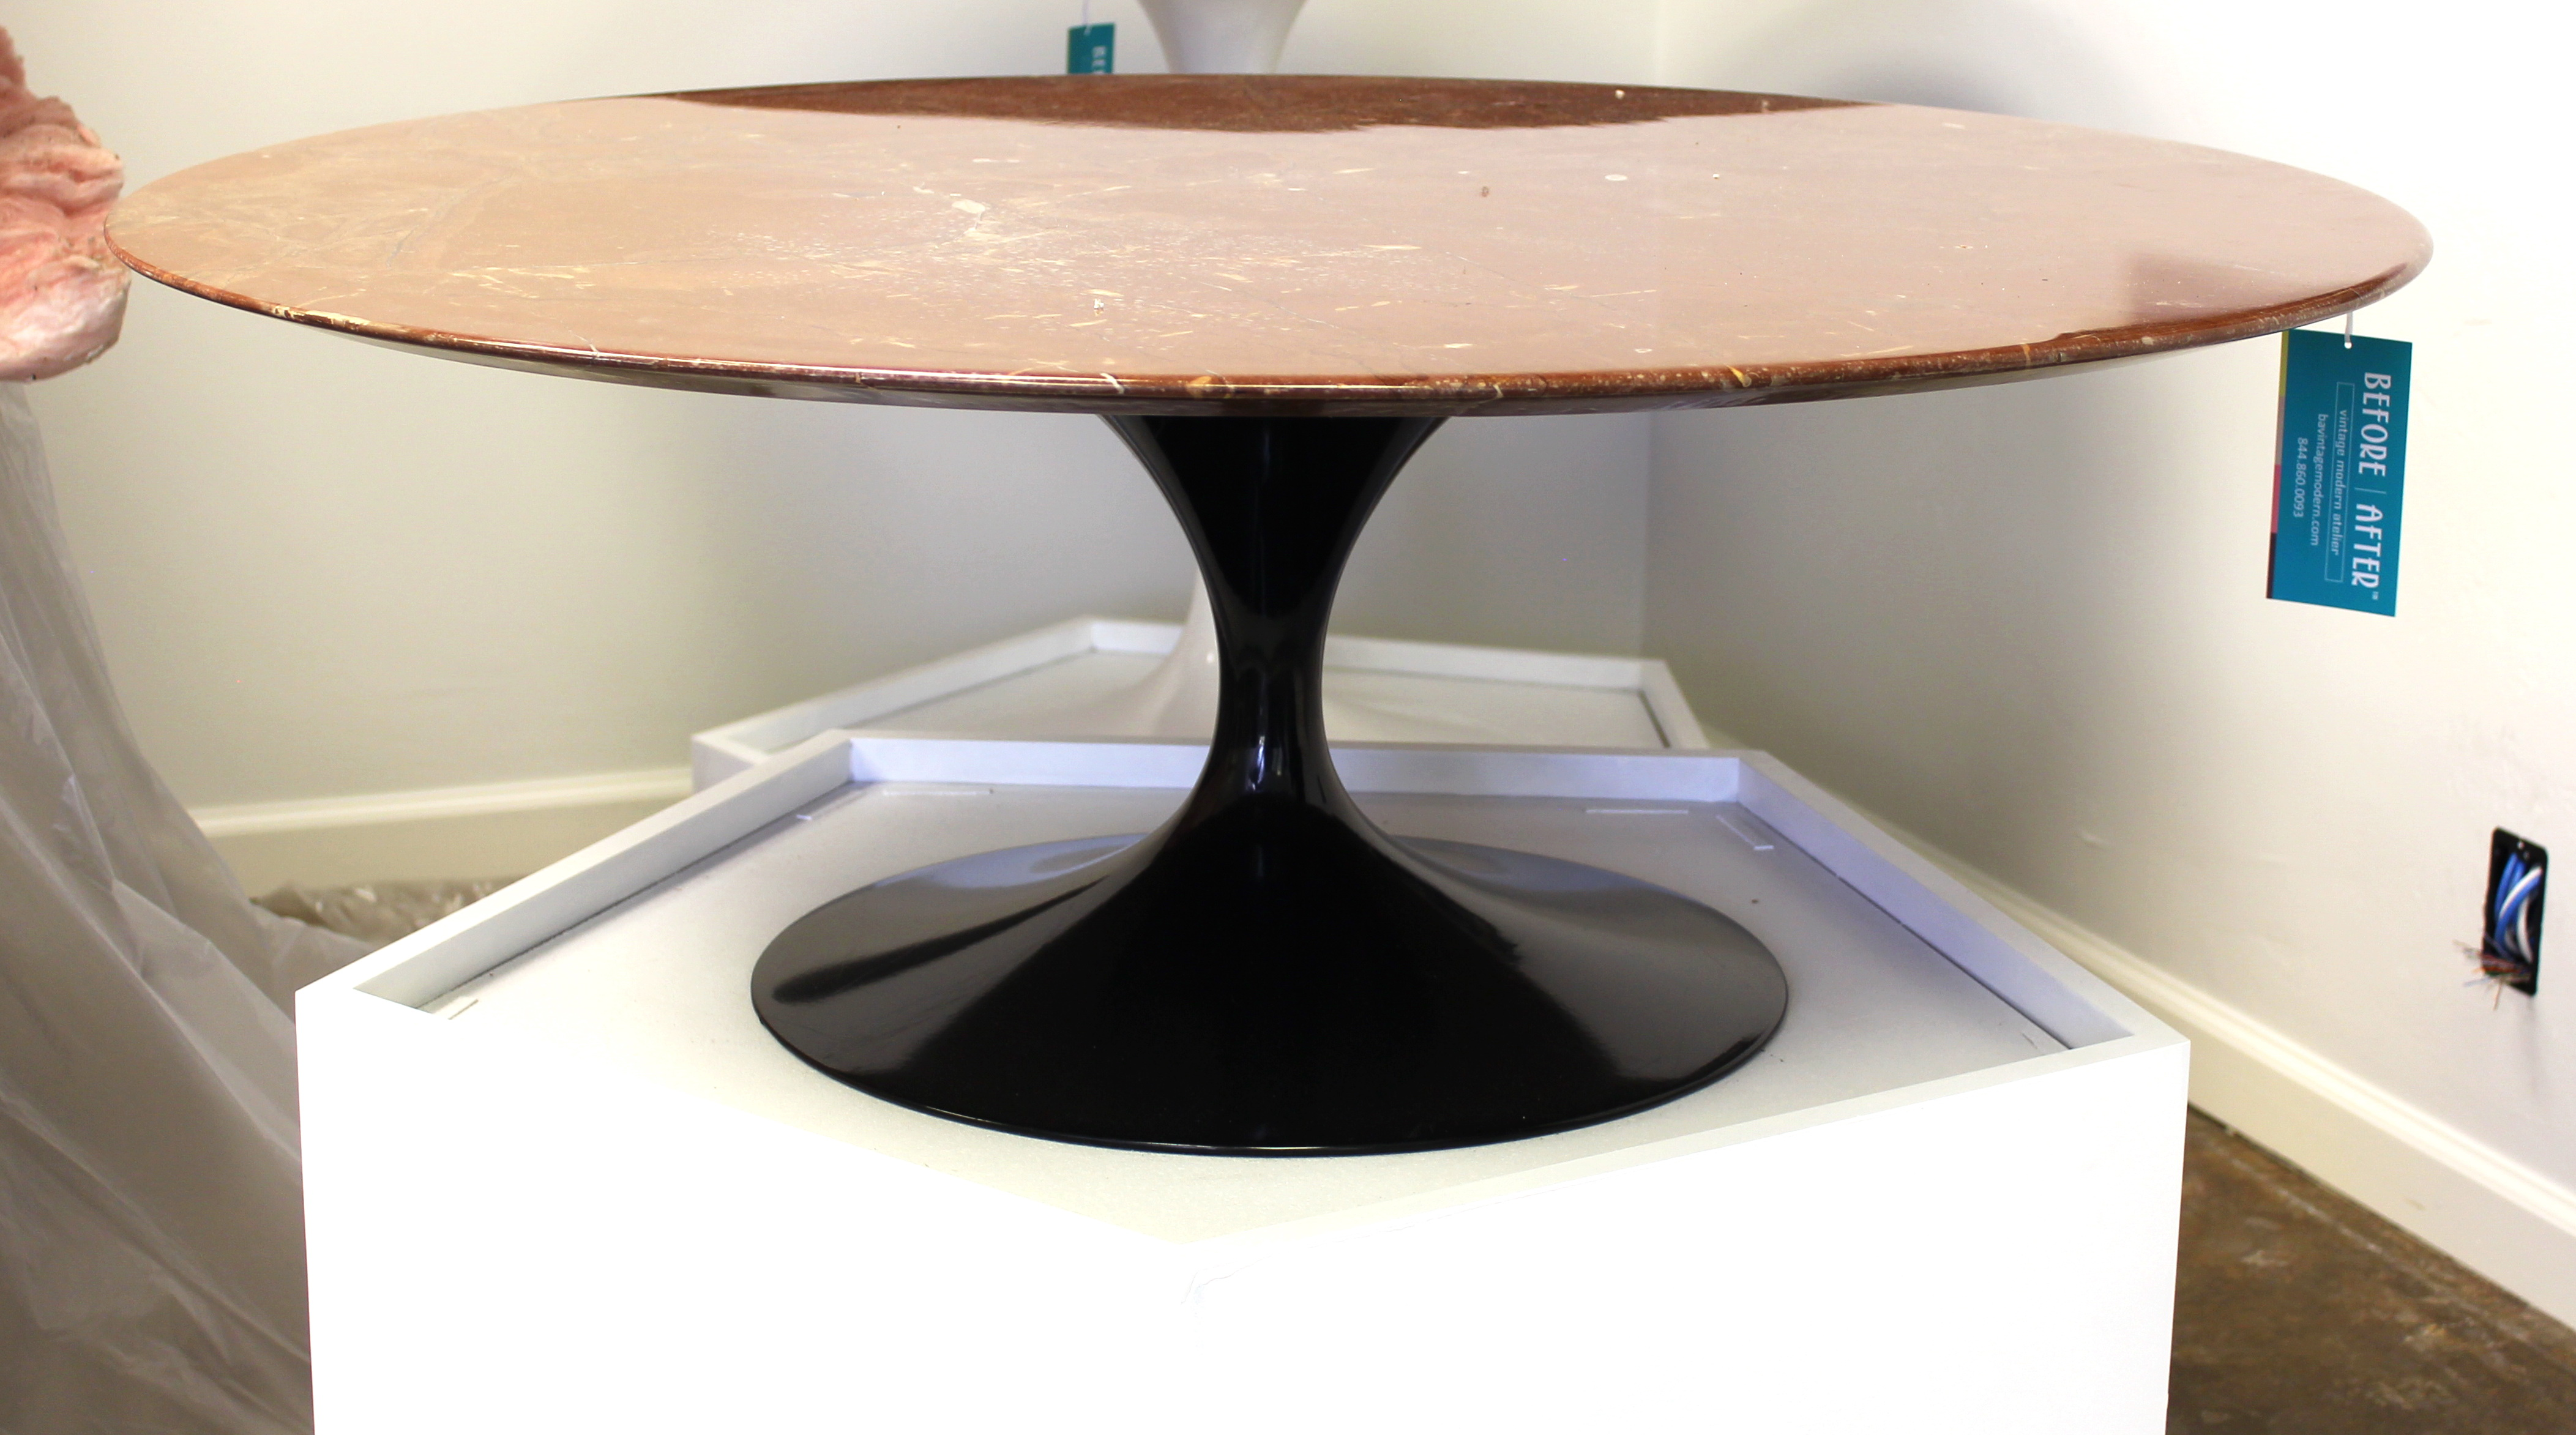 eero saarinen coffee table pink marble top and black tulip base furniture basix. Black Bedroom Furniture Sets. Home Design Ideas